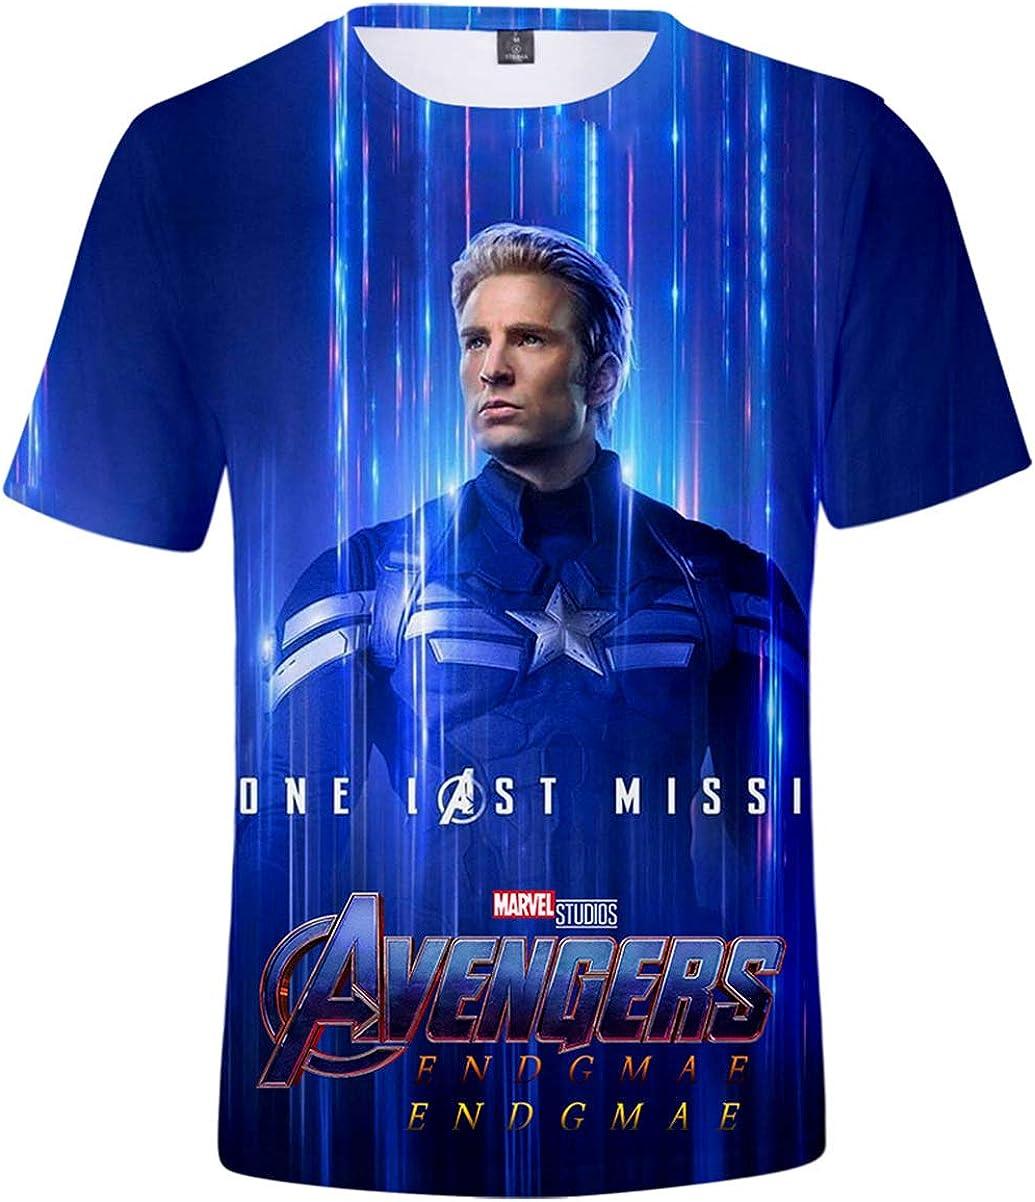 Hombre Camiseta Avengers Superhero Captain America, Iron Man Cosplay Manga Corta: Amazon.es: Ropa y accesorios